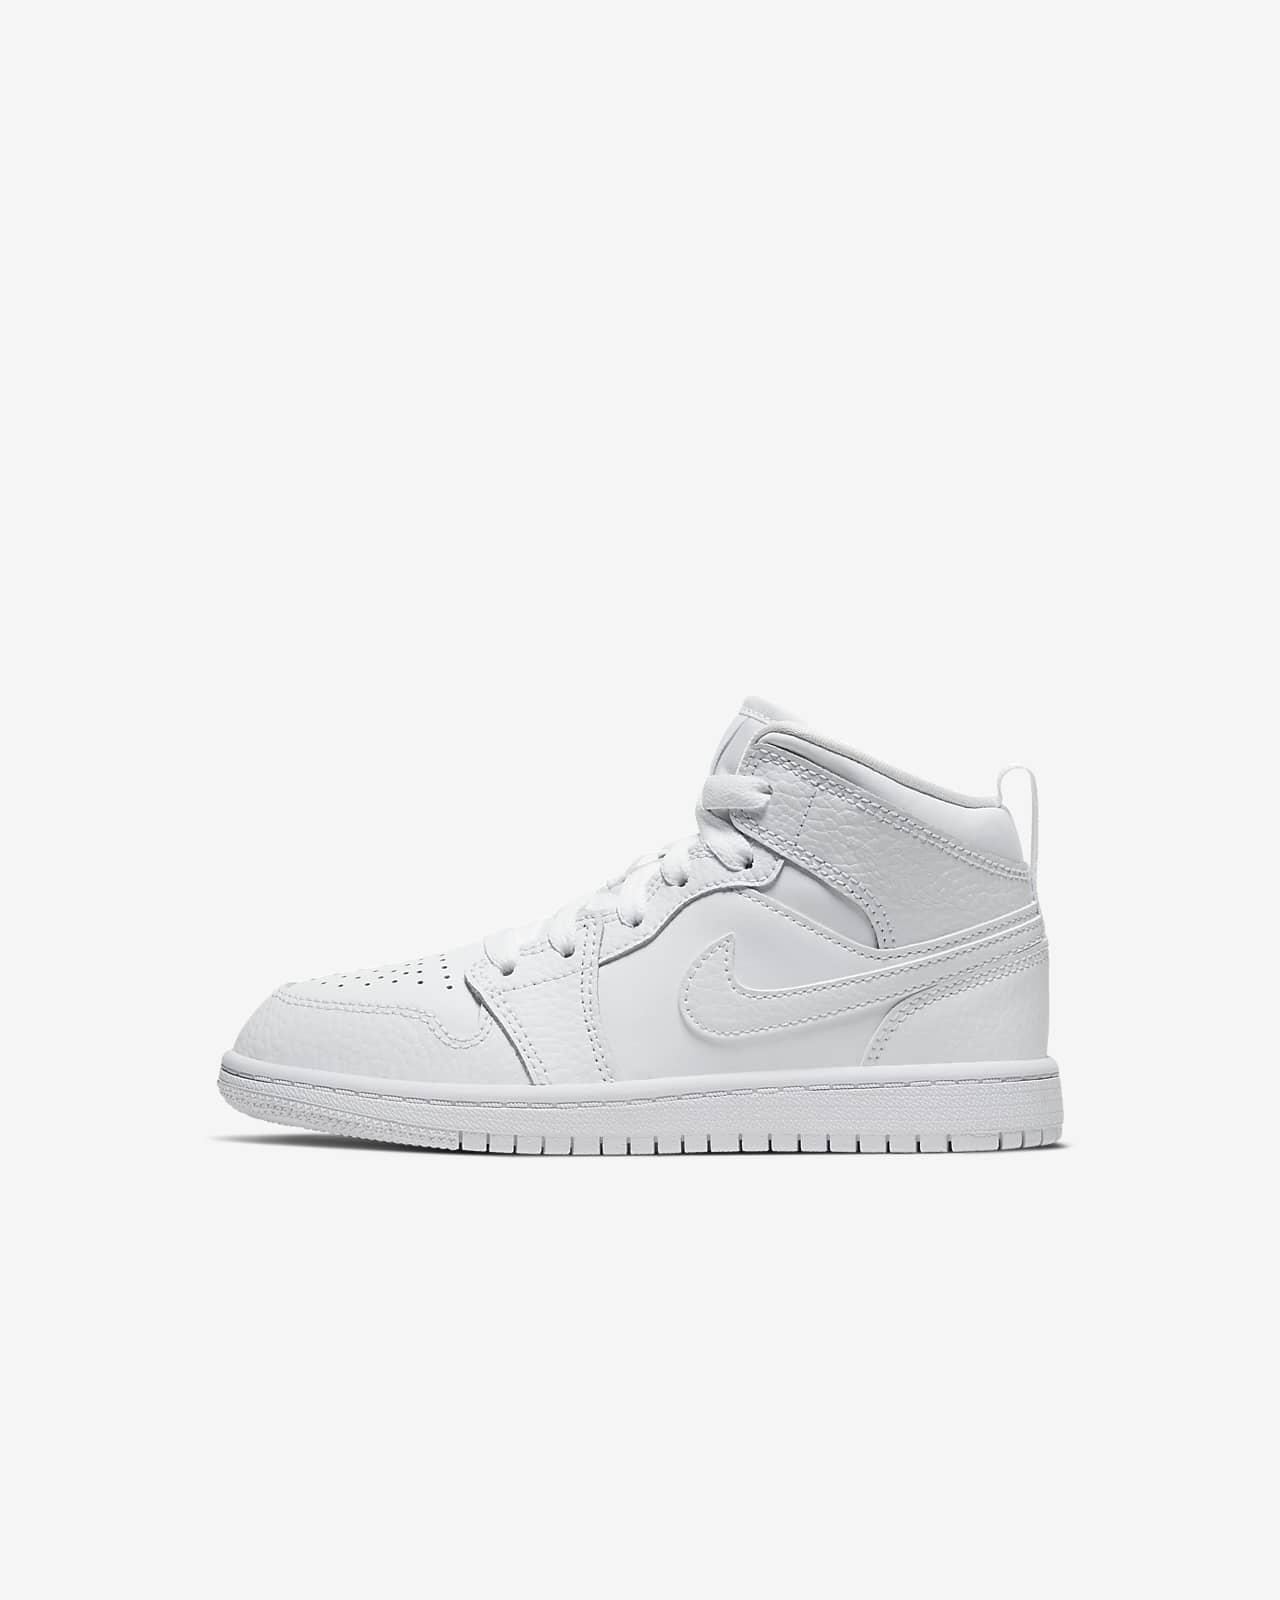 Jordan 1 Mid. Nike